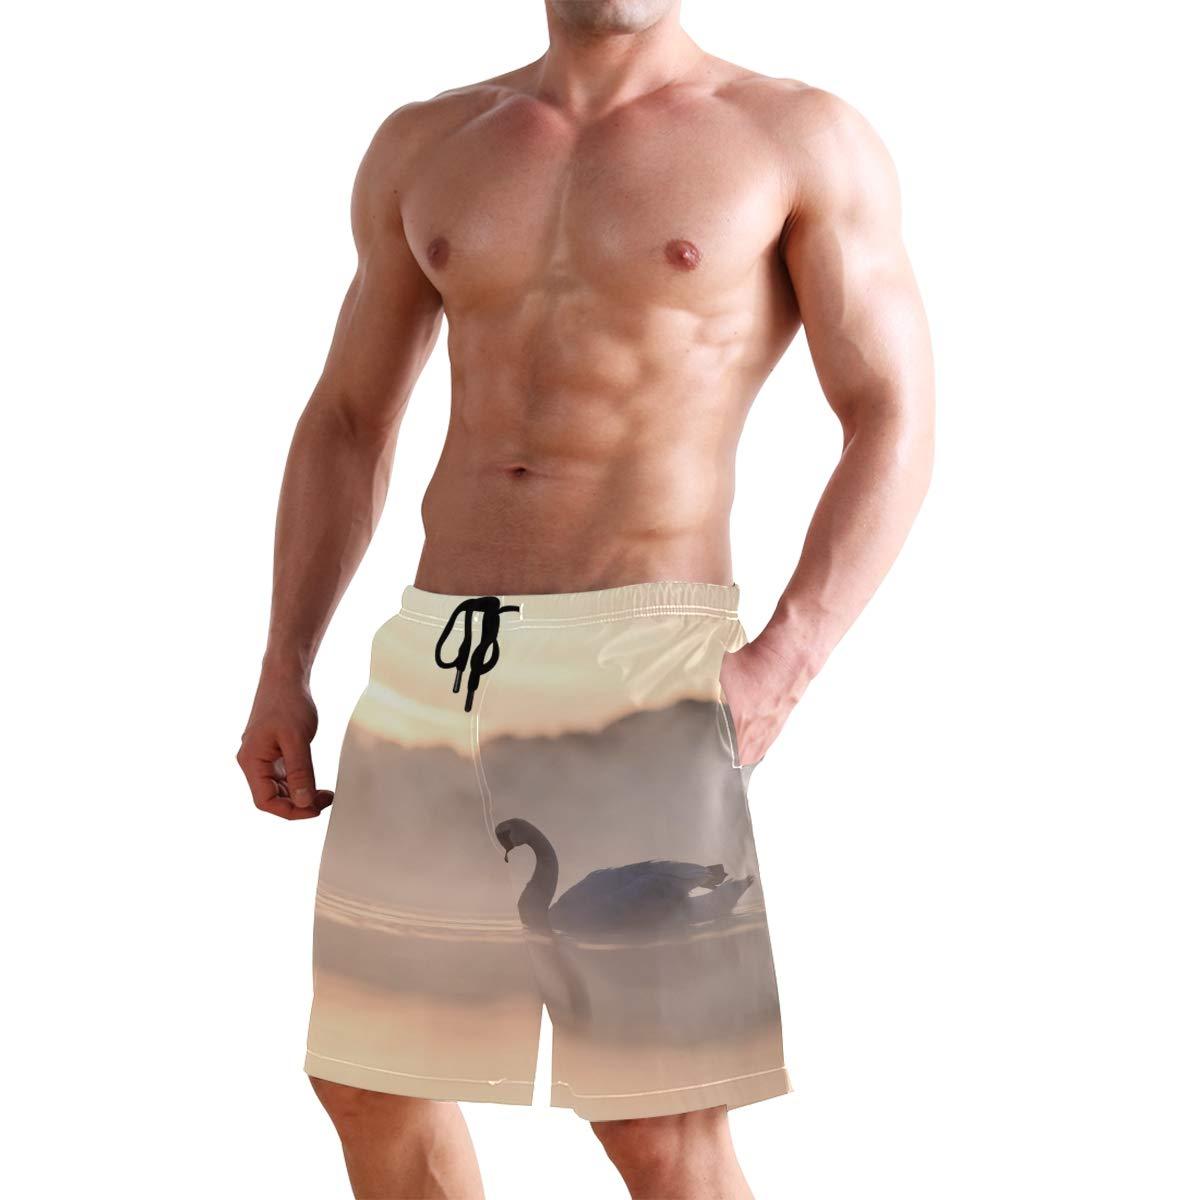 CiCily Men/'s Swim Trunks Swan Beach Board Shorts Swimming Short Pants Running Sports Surffing Shorts